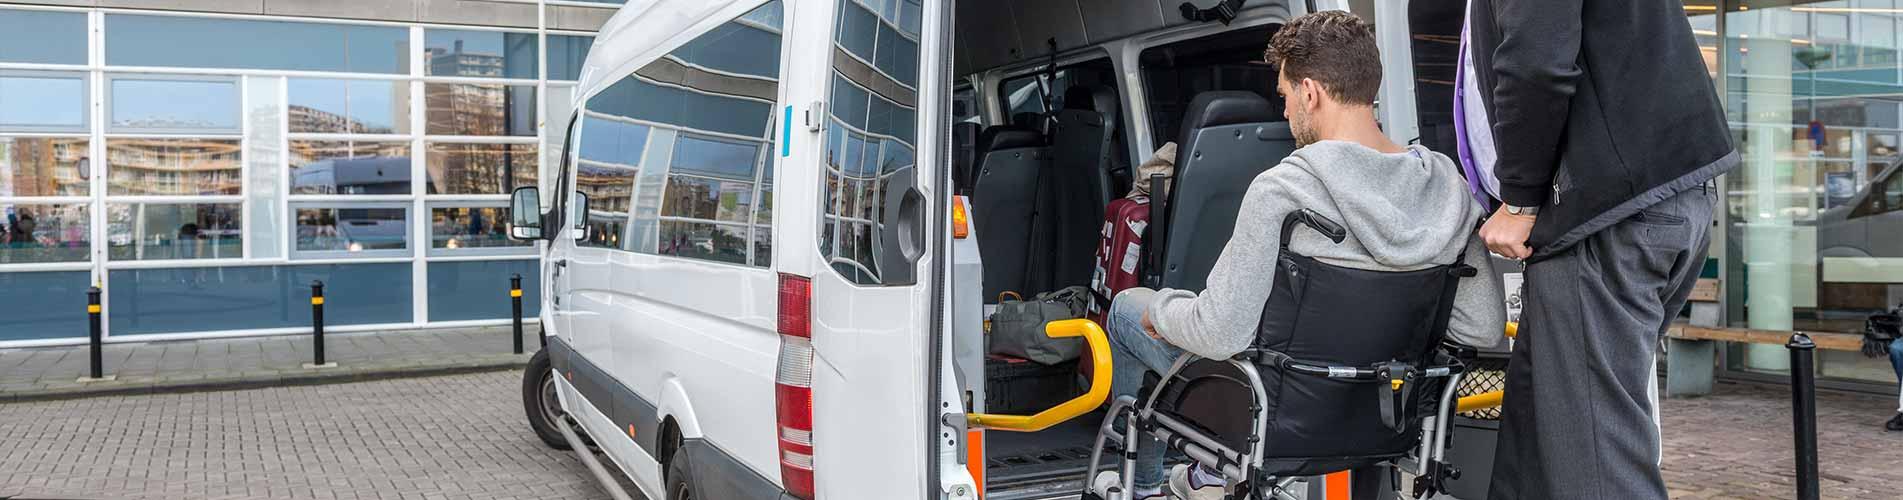 Wheelchair-Transportation-Services